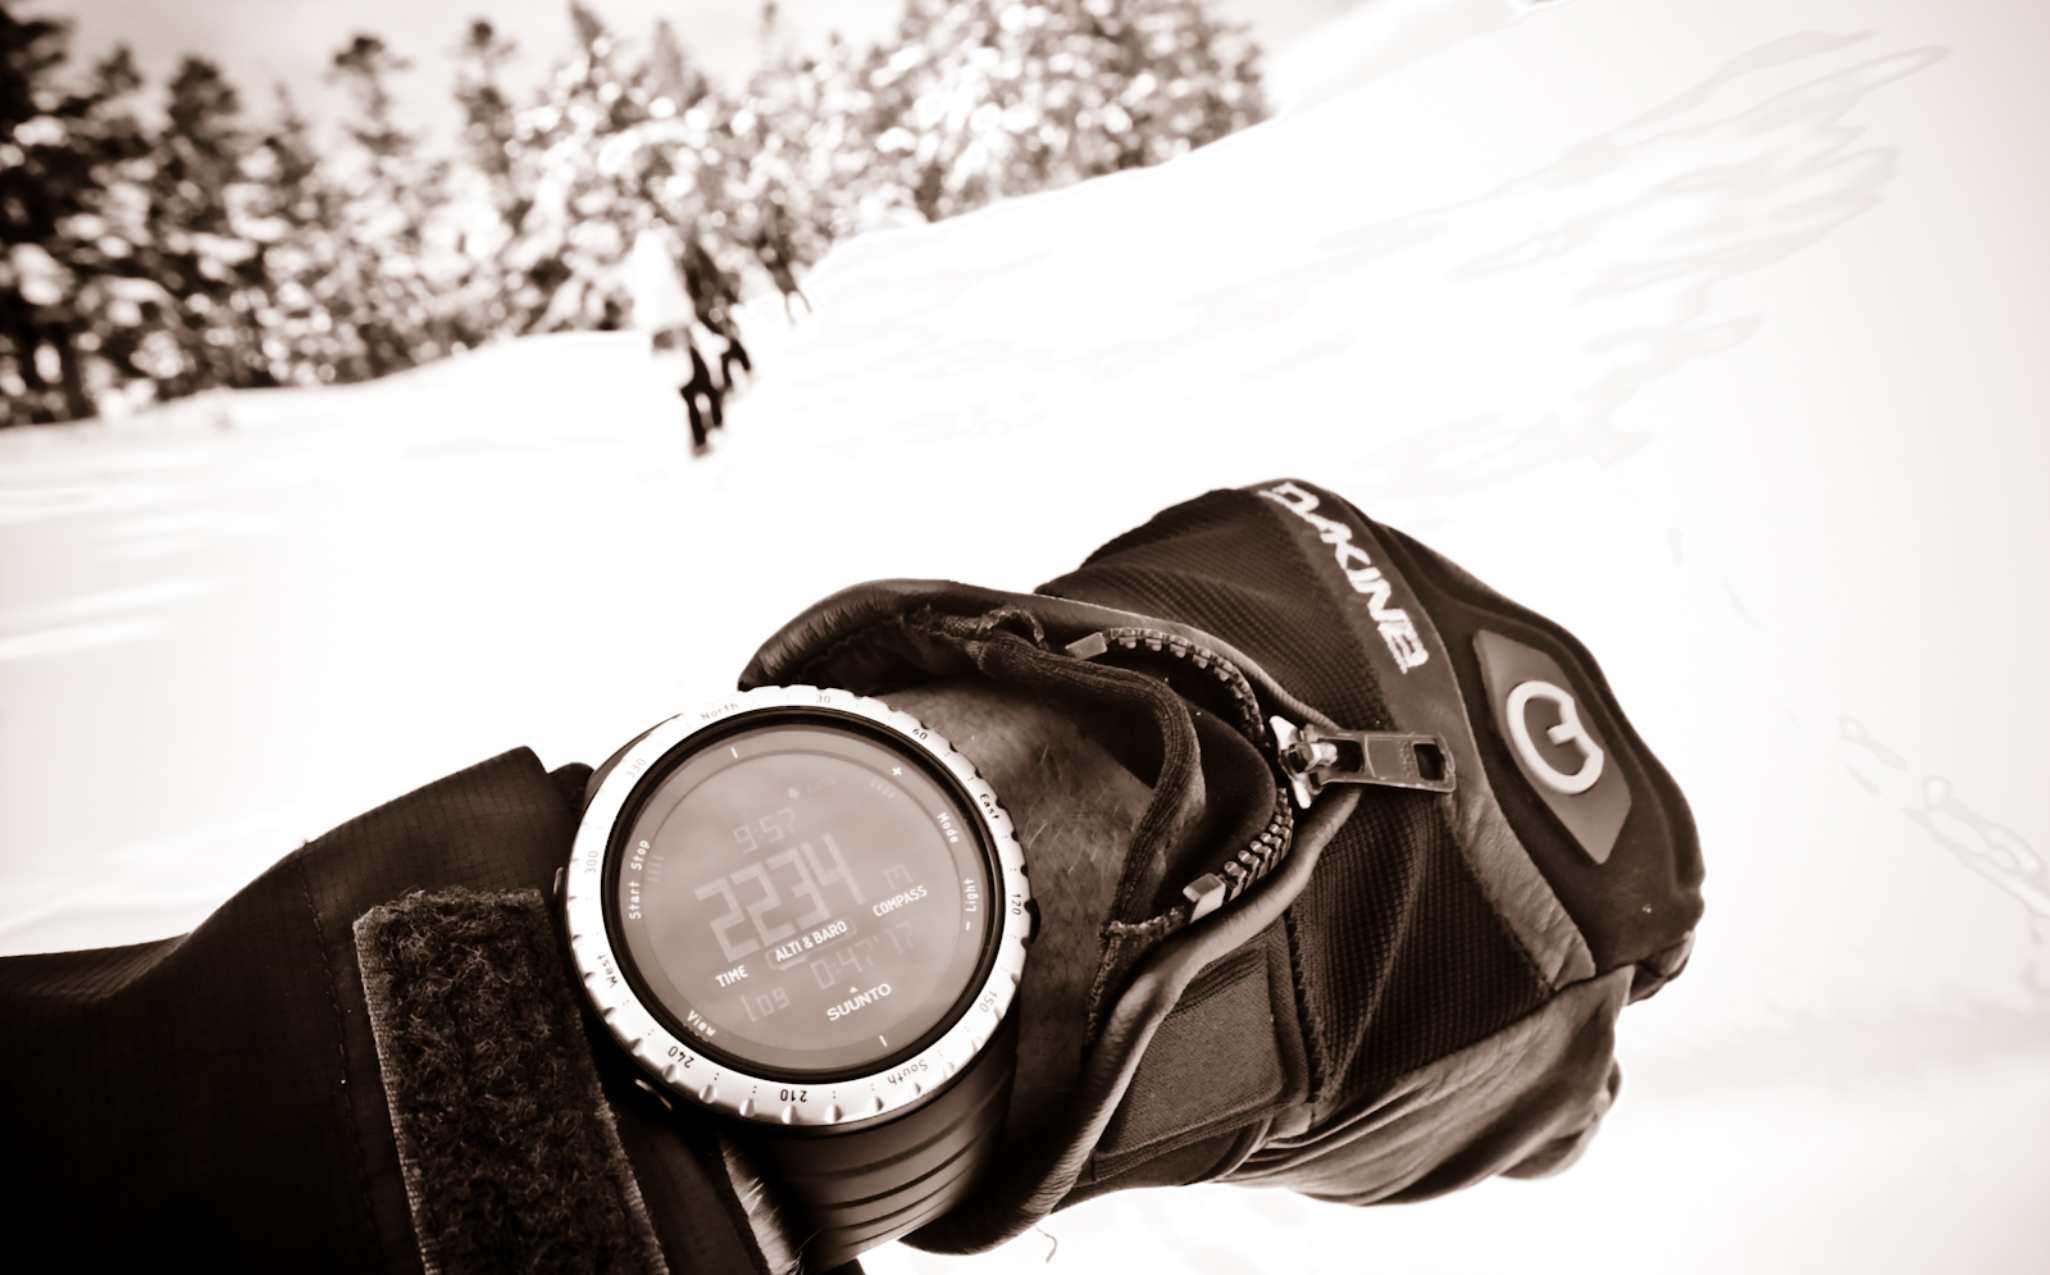 Kimakochi Walk Snowboarding Speed